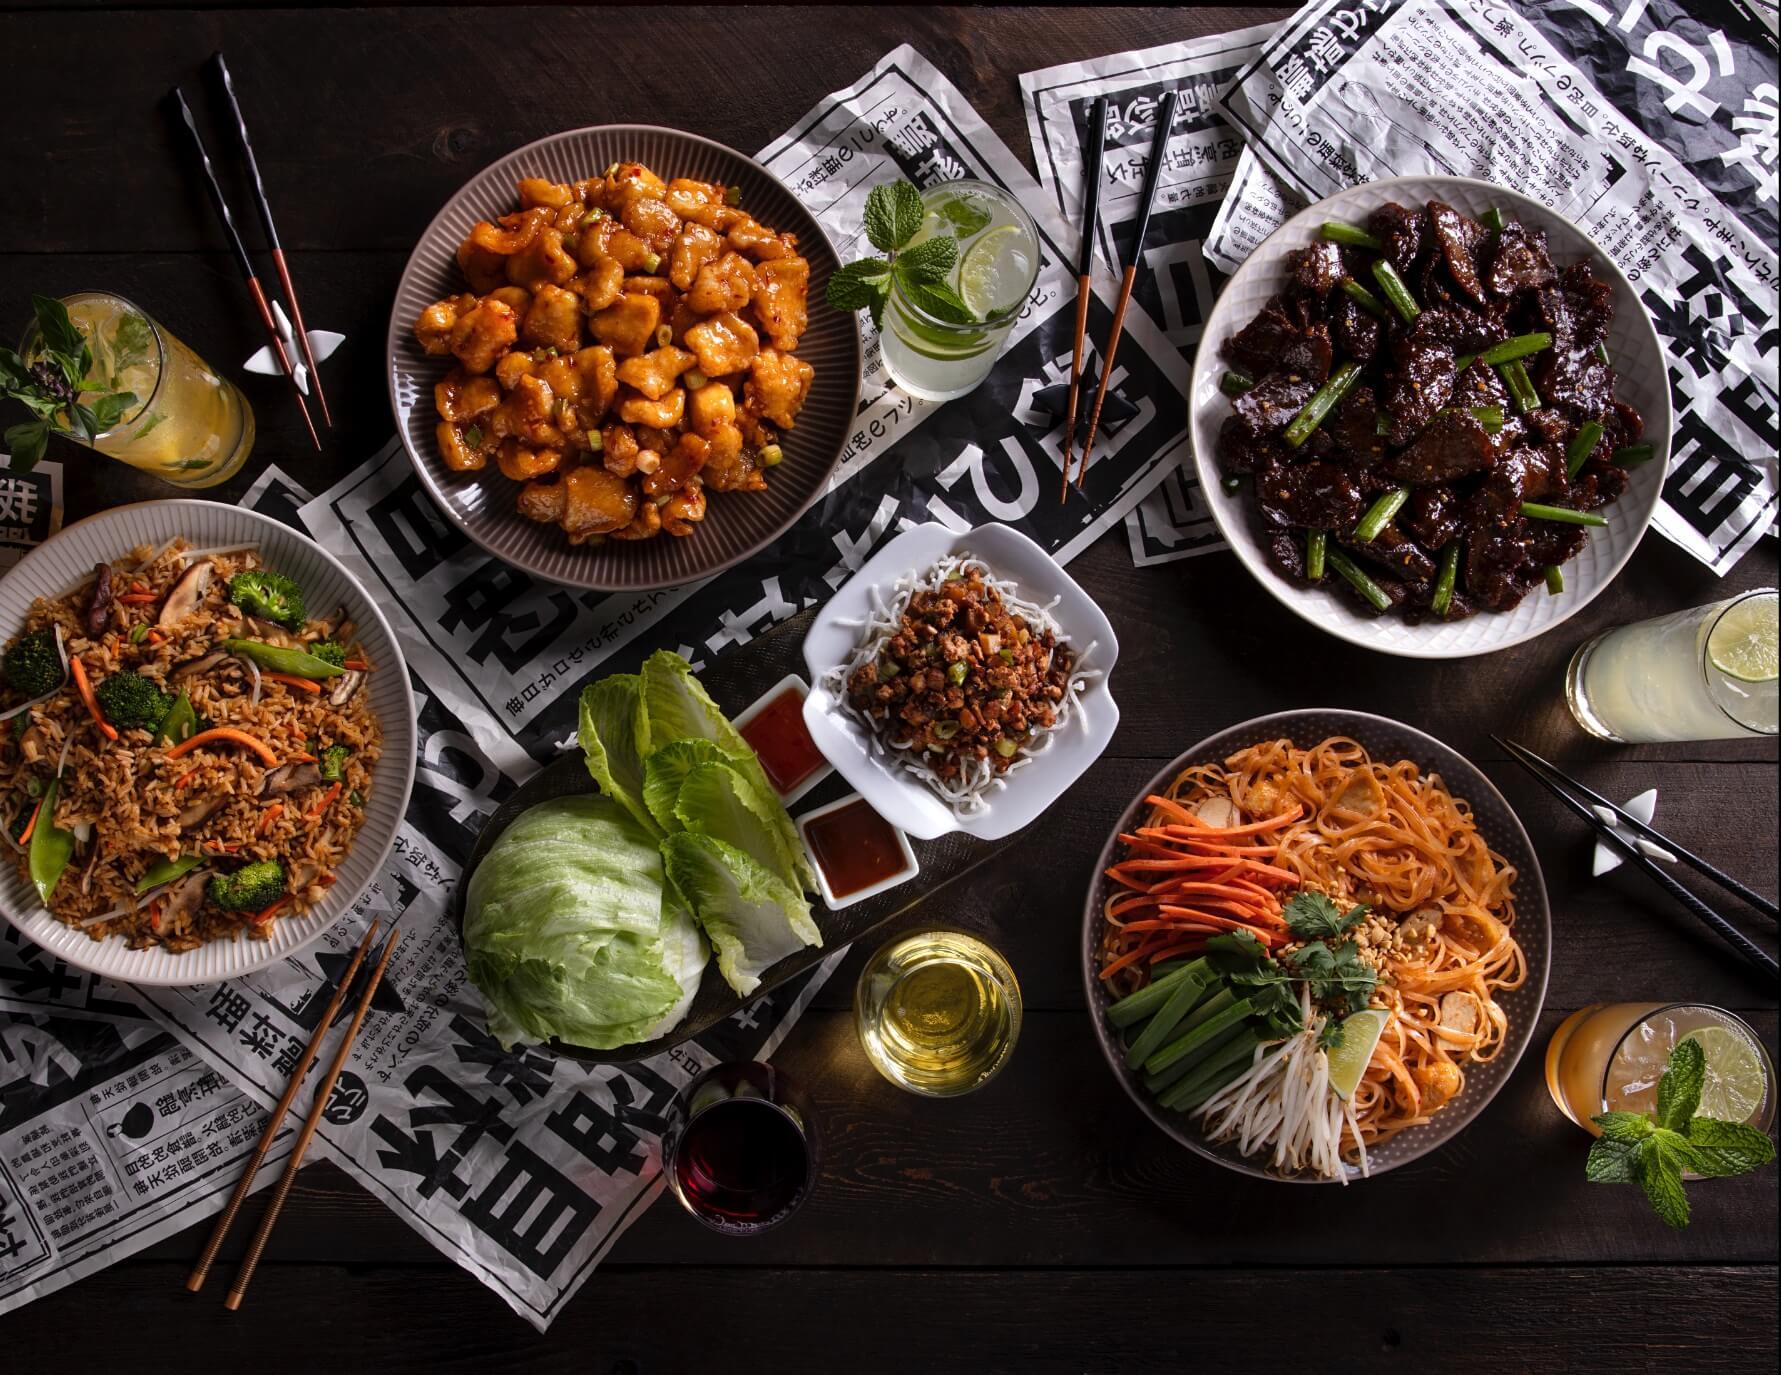 pf chang's delivery in winnipeg - delivery menu - doordash